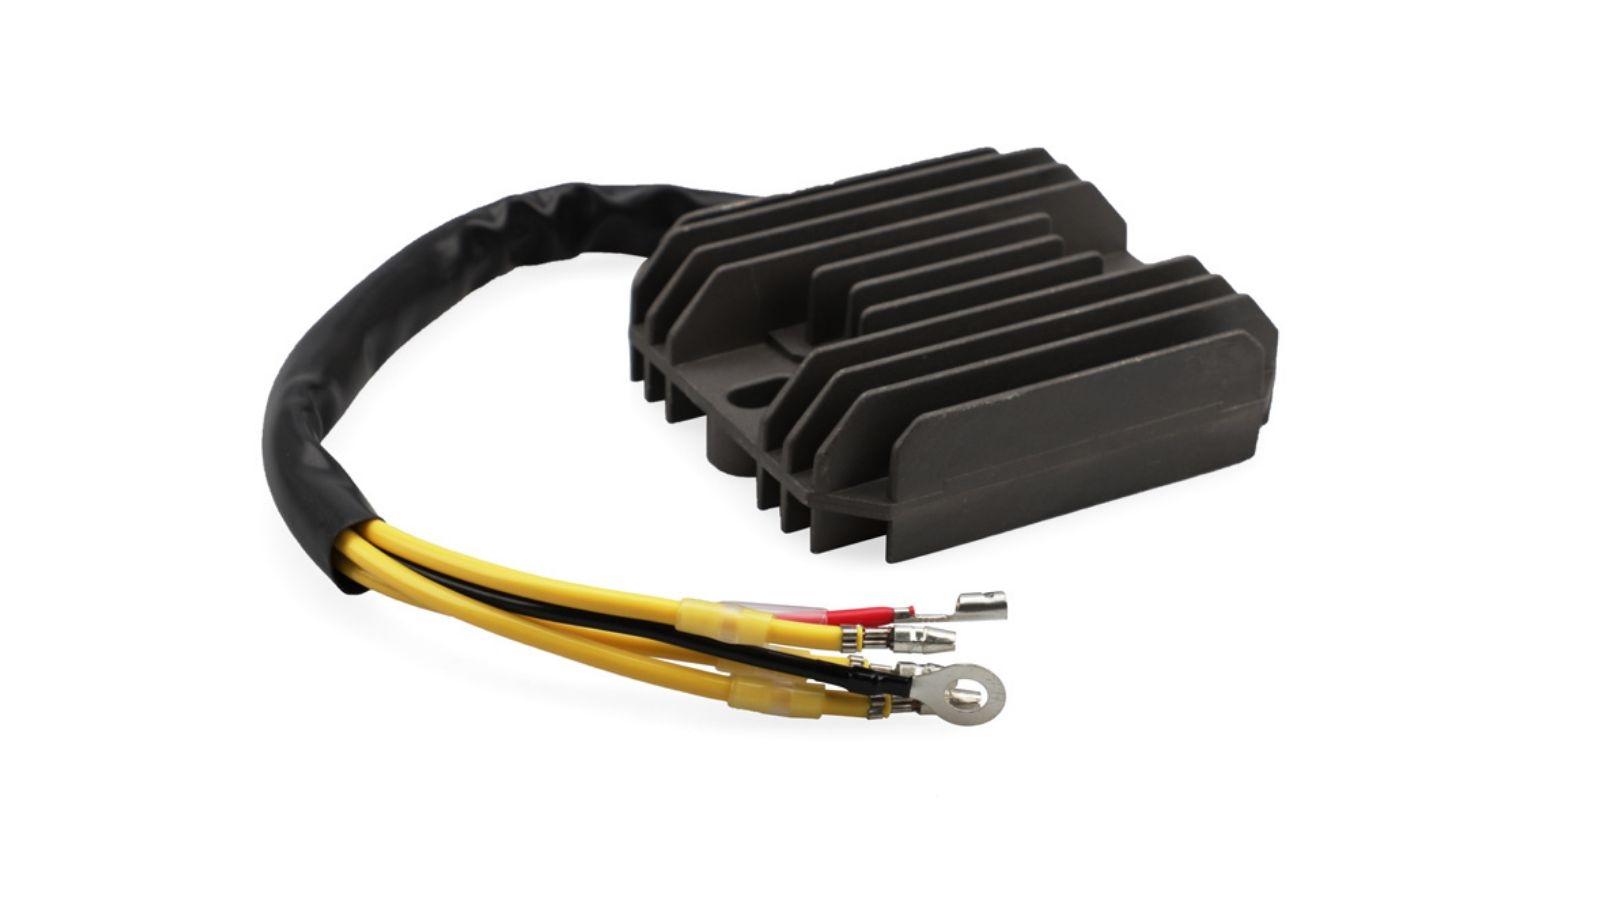 4 Wires 12V Motorcycle Voltage Rectifier Regulator Stabilizer